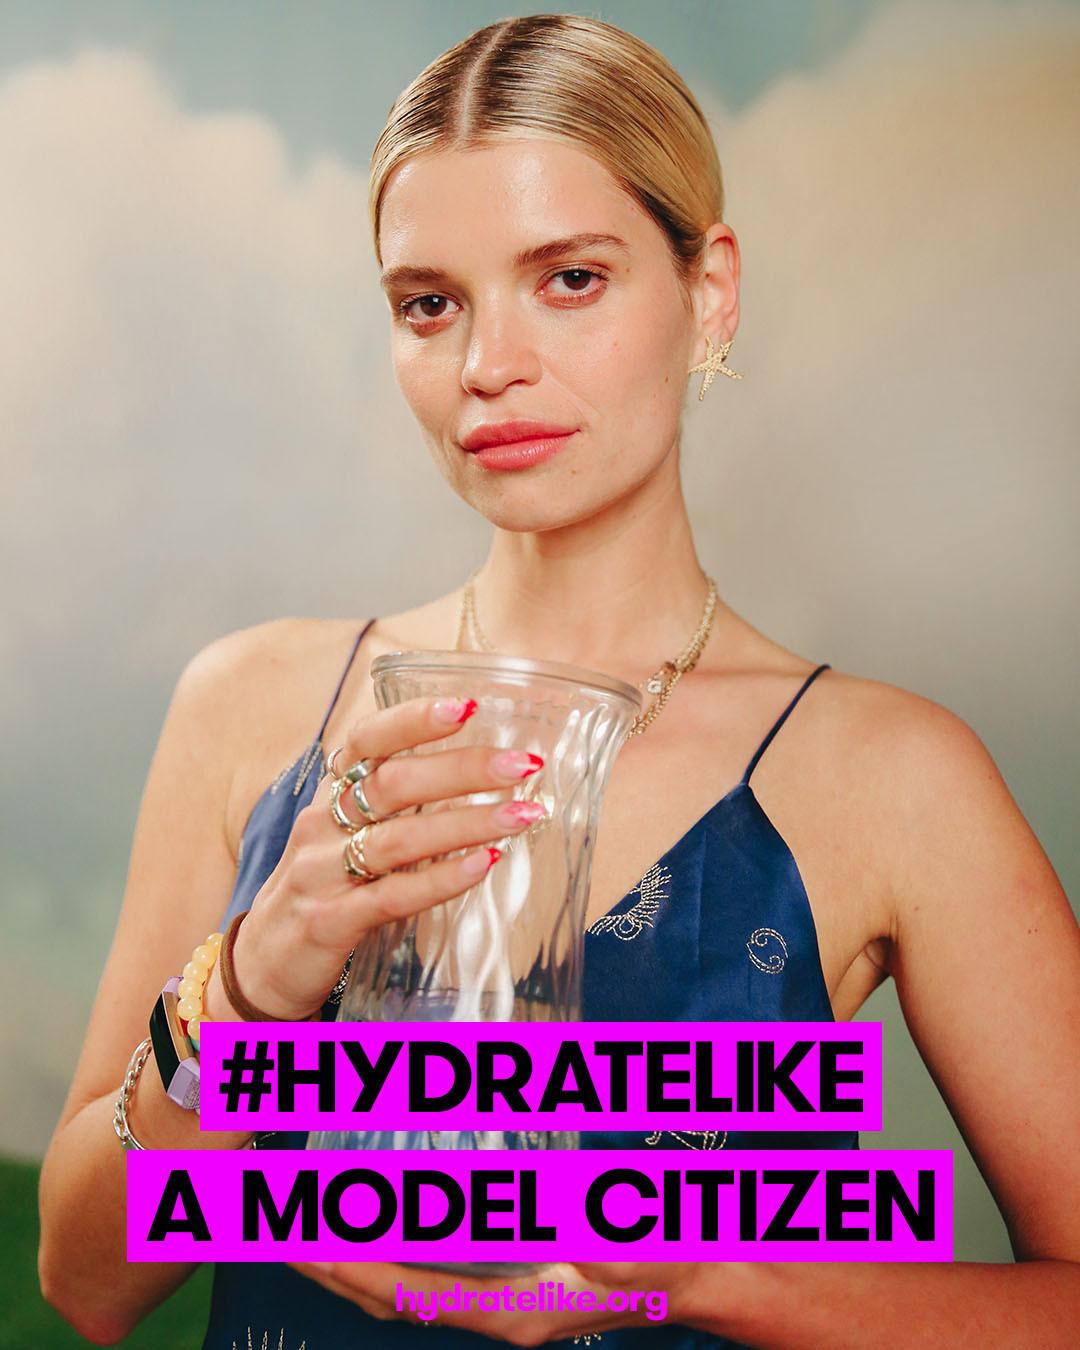 Hydrate Like Pixie Geldof